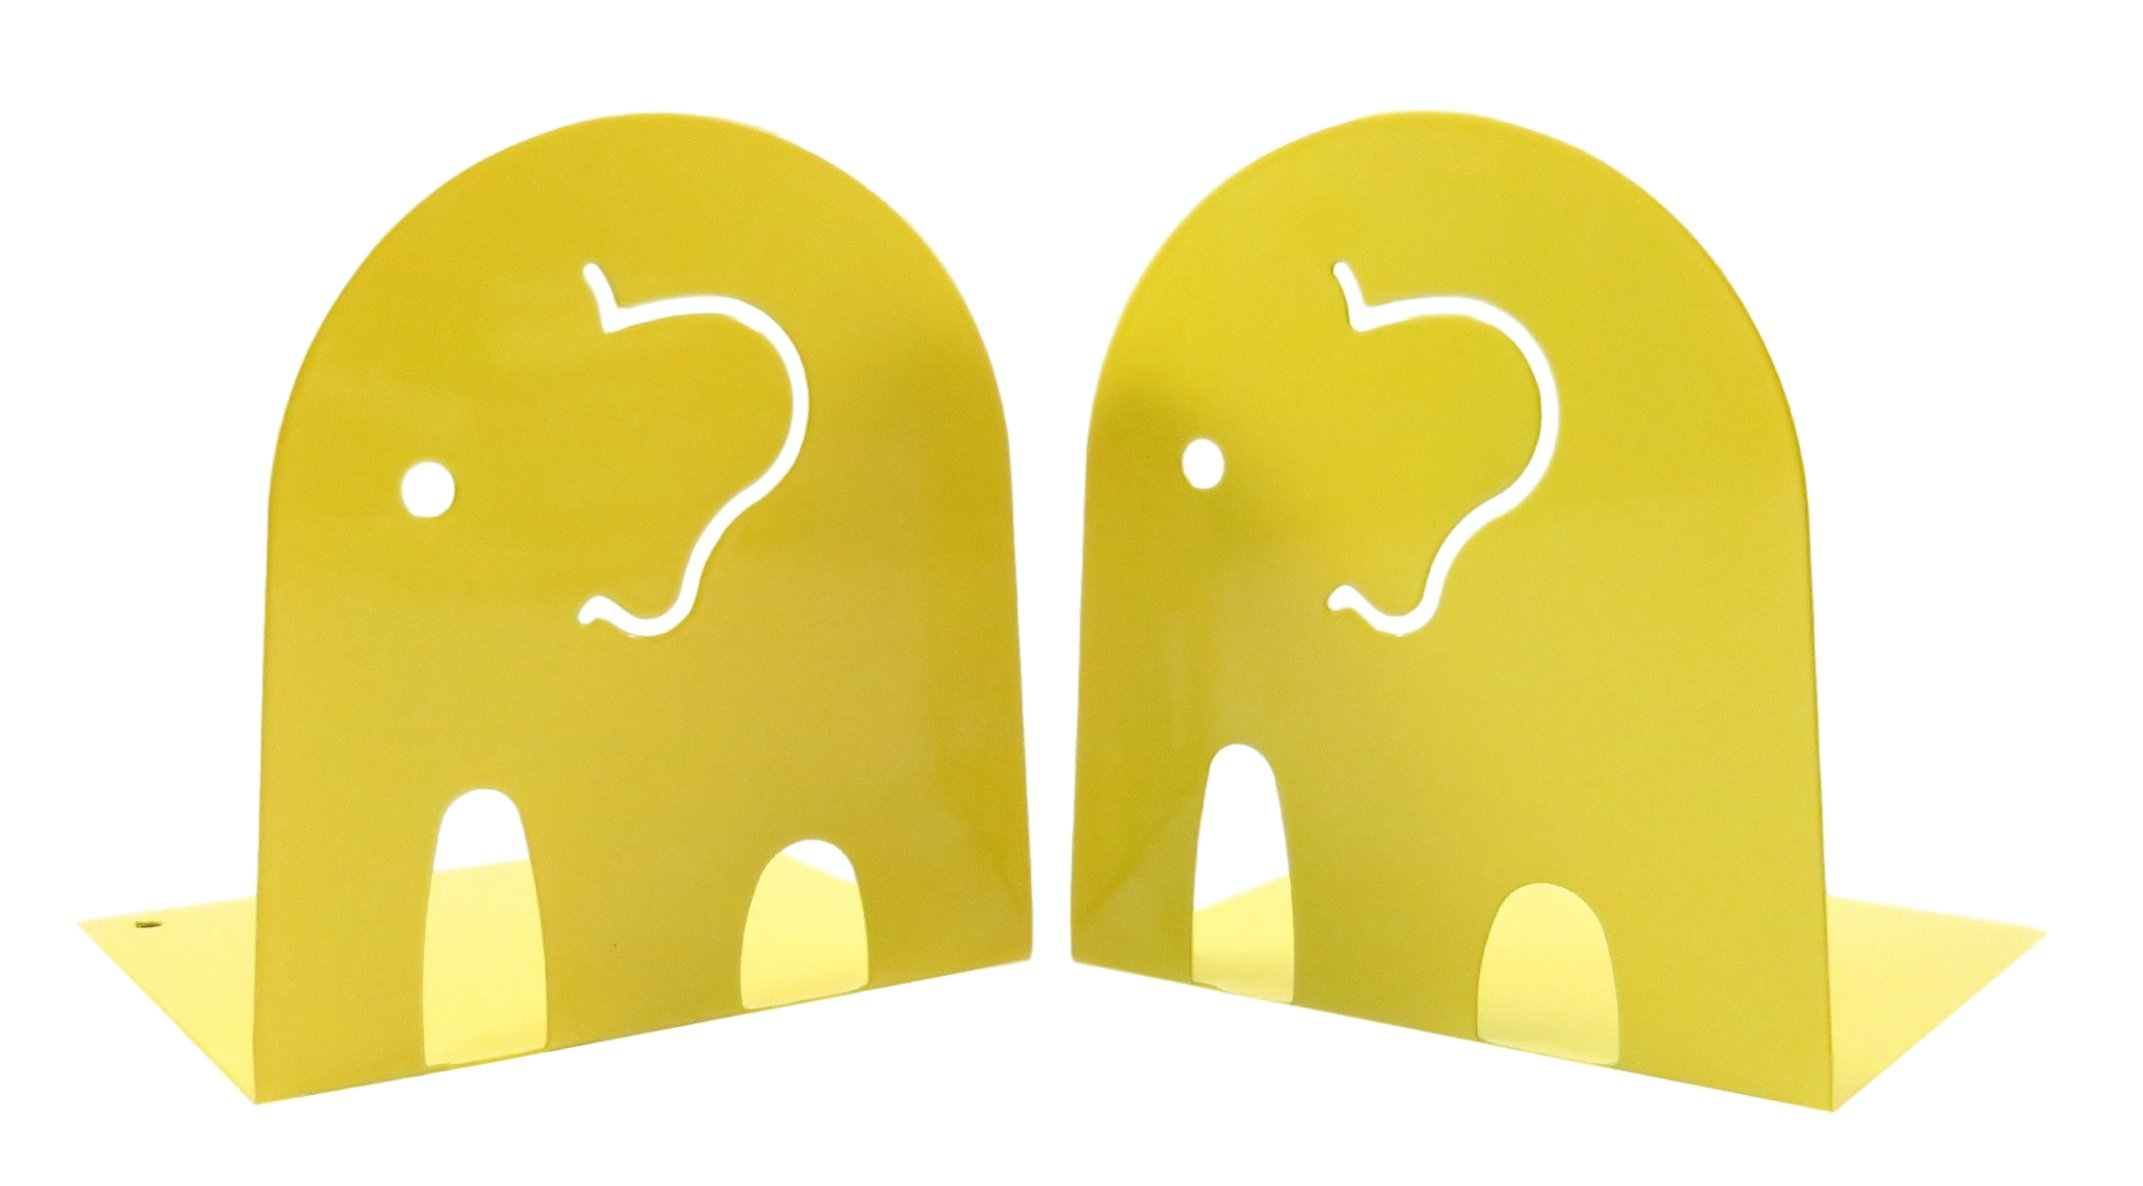 Kids Fun Elephant Non-Skid Metal Bookends 4 1/2'' x 4 3/4'' Yellow (1 Set)